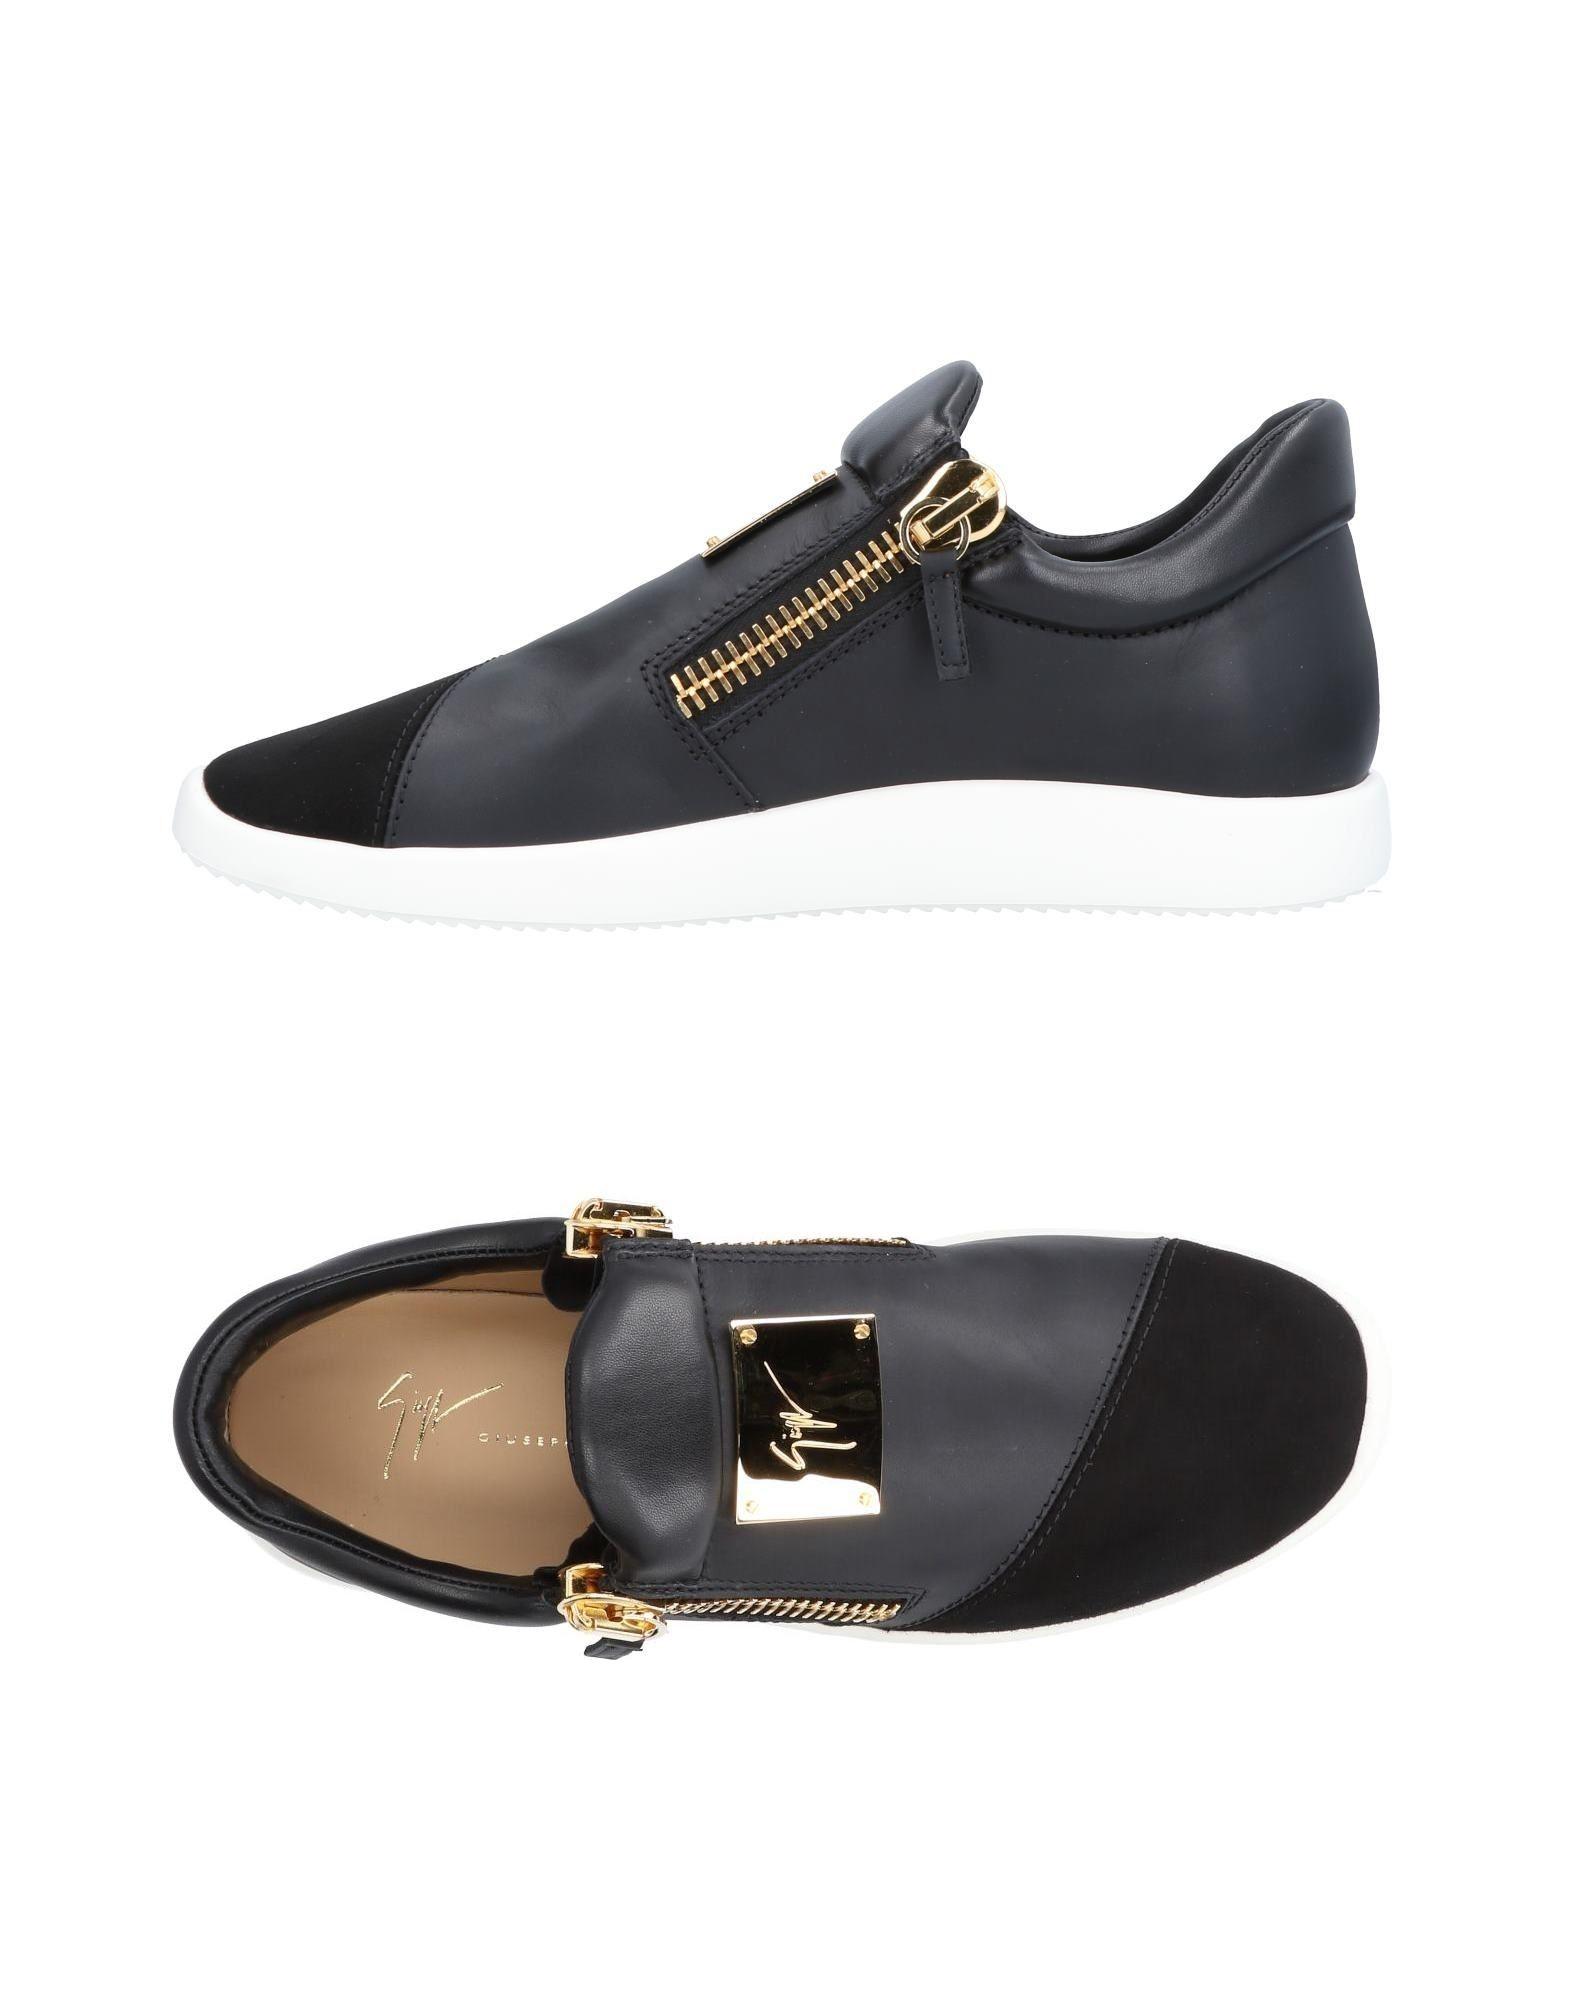 Giuseppe Zanotti Sneakers Herren  11496164PV Gute Qualität beliebte Schuhe